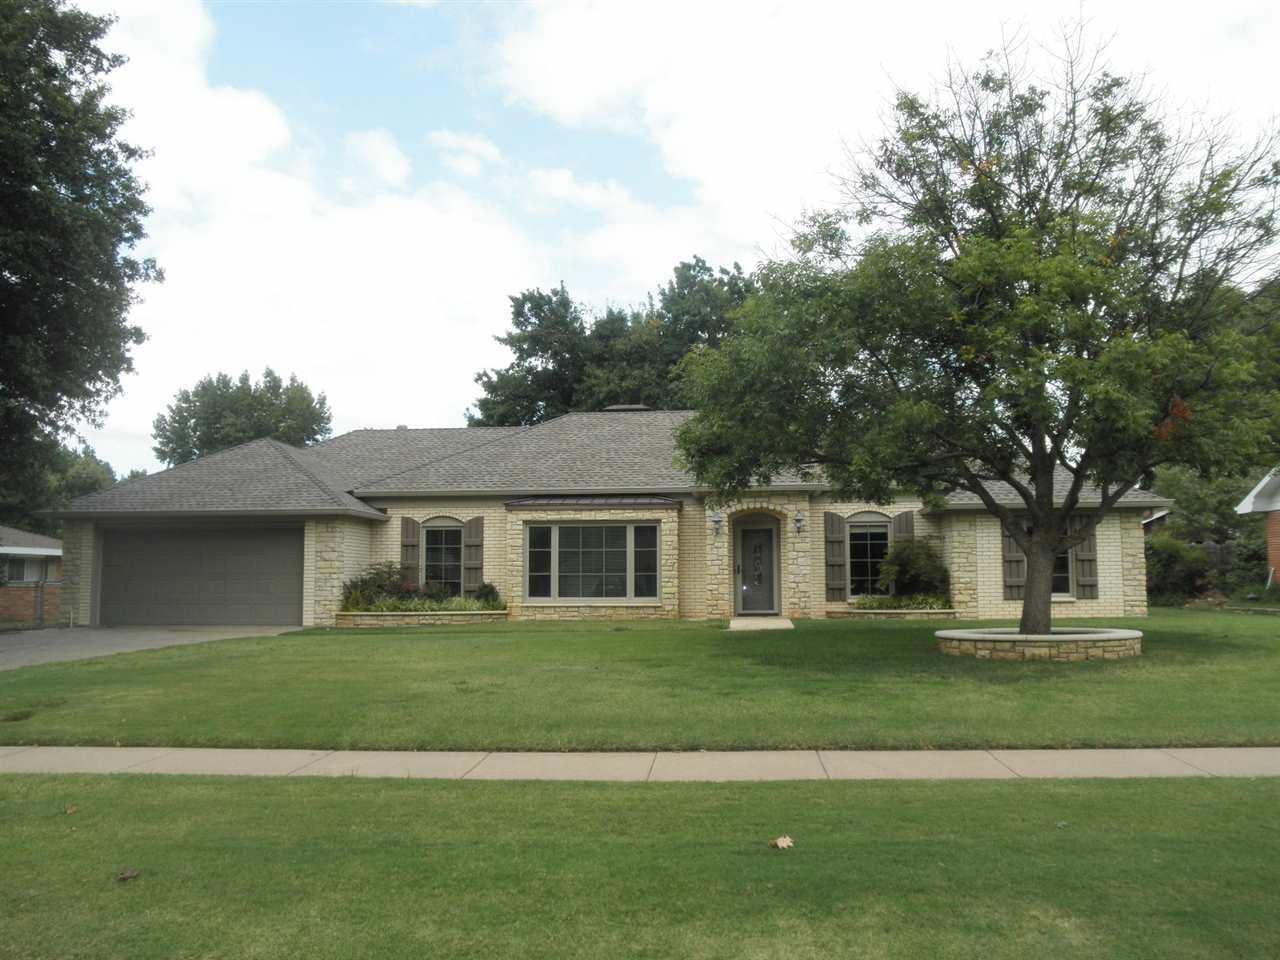 Sold Intraoffice W/MLS   2411 Mockingbird  Ponca City, OK 74604 0